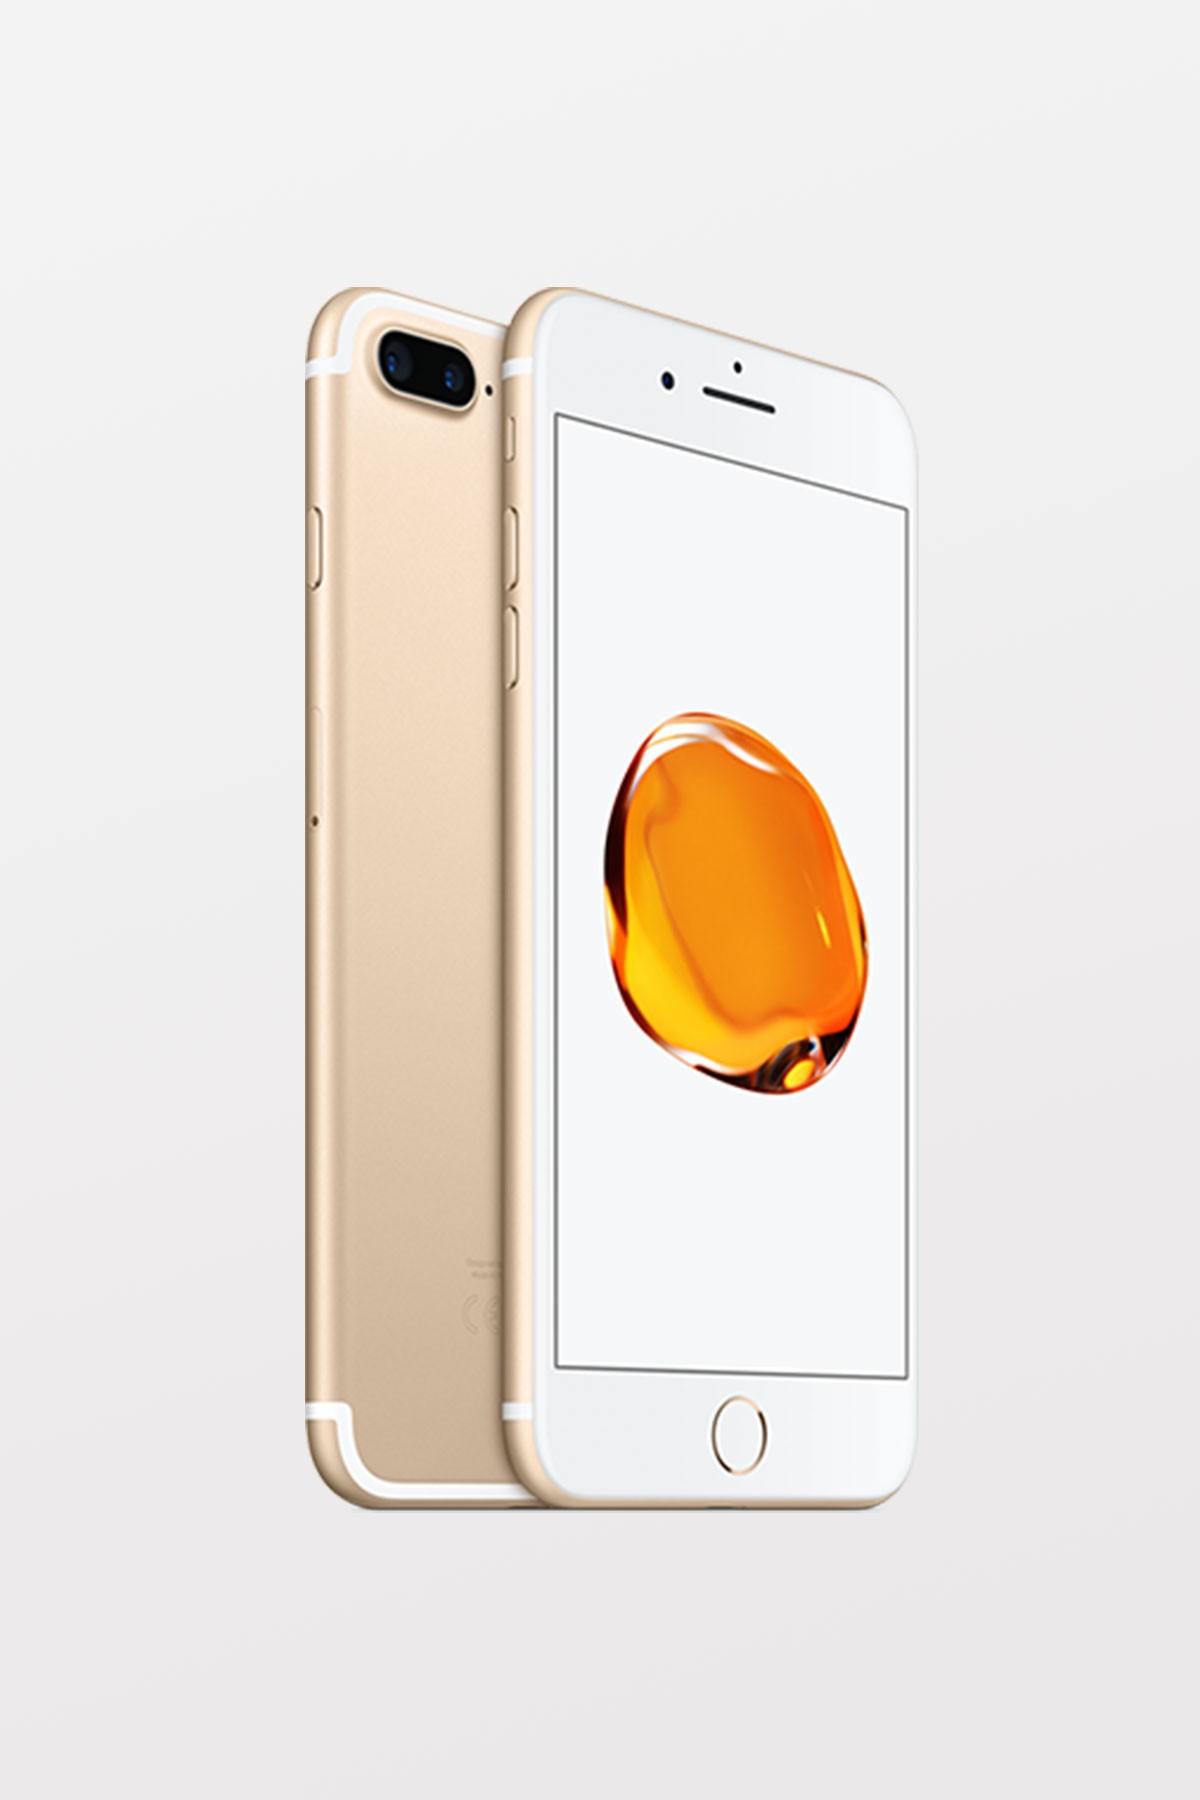 Apple iPhone 7 Plus 128GB - Gold - Refurbished